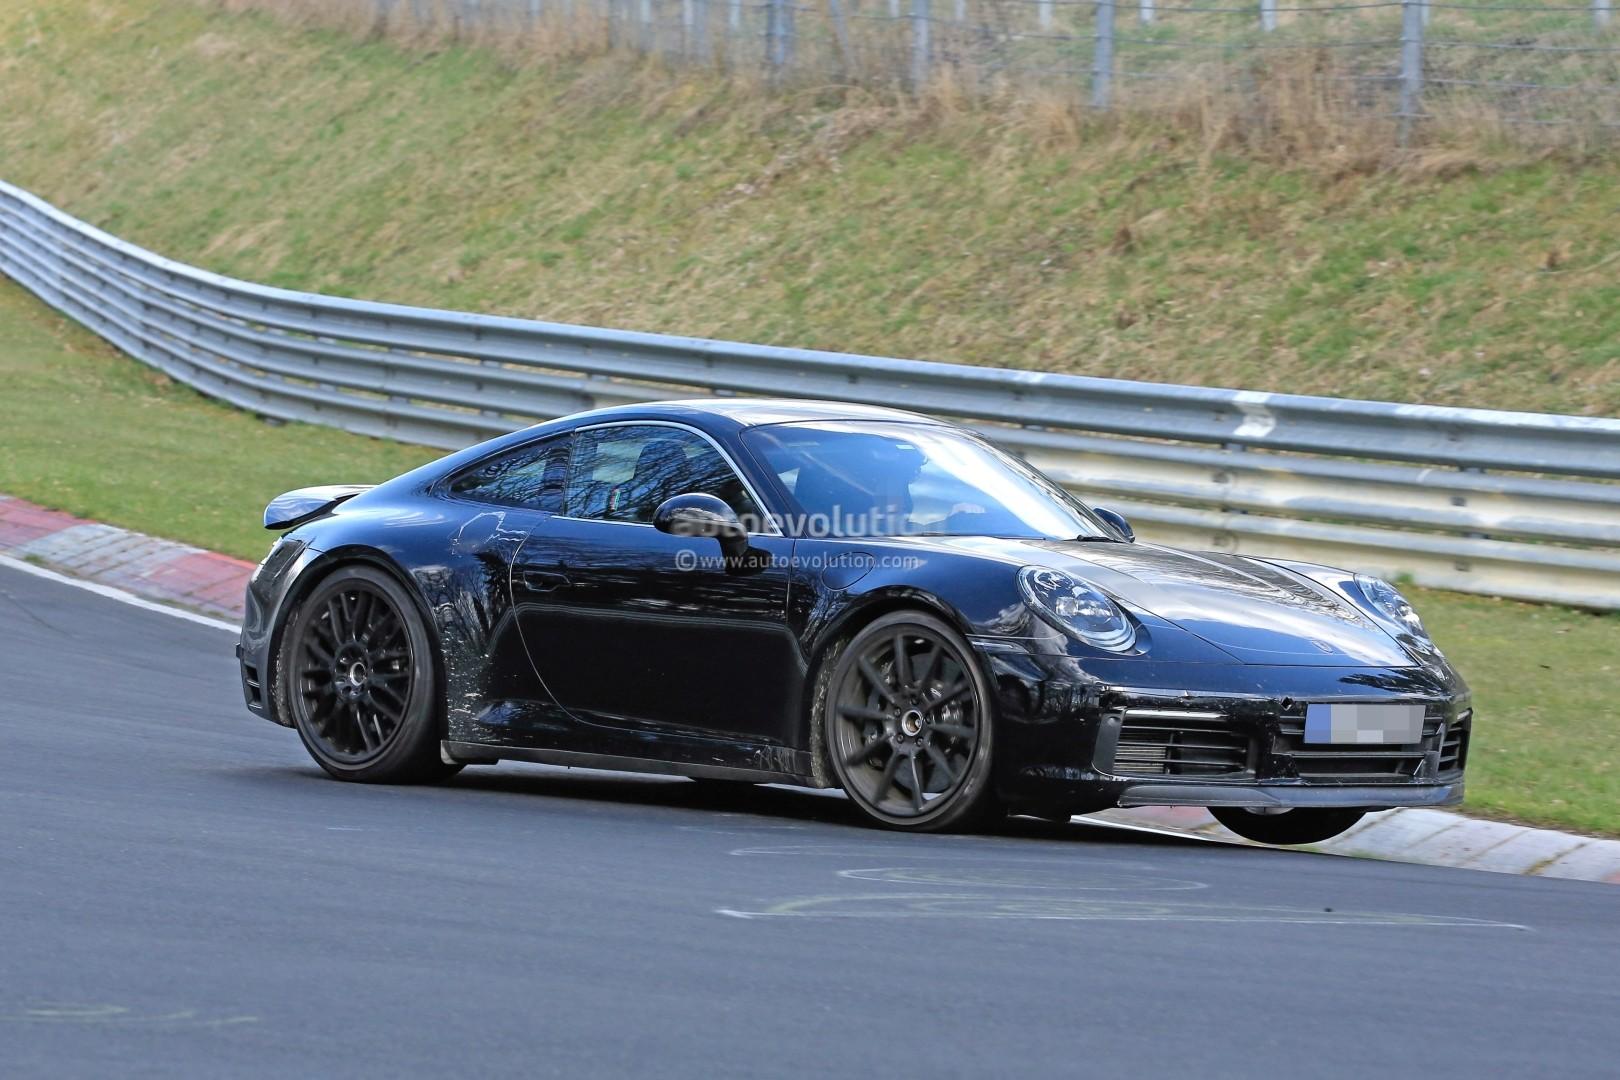 2018 - [Porsche] 911 - Page 3 New-2019-porsche-911-makes-nurburgring-debut-prototype-has-mysterios-fuel-door_4